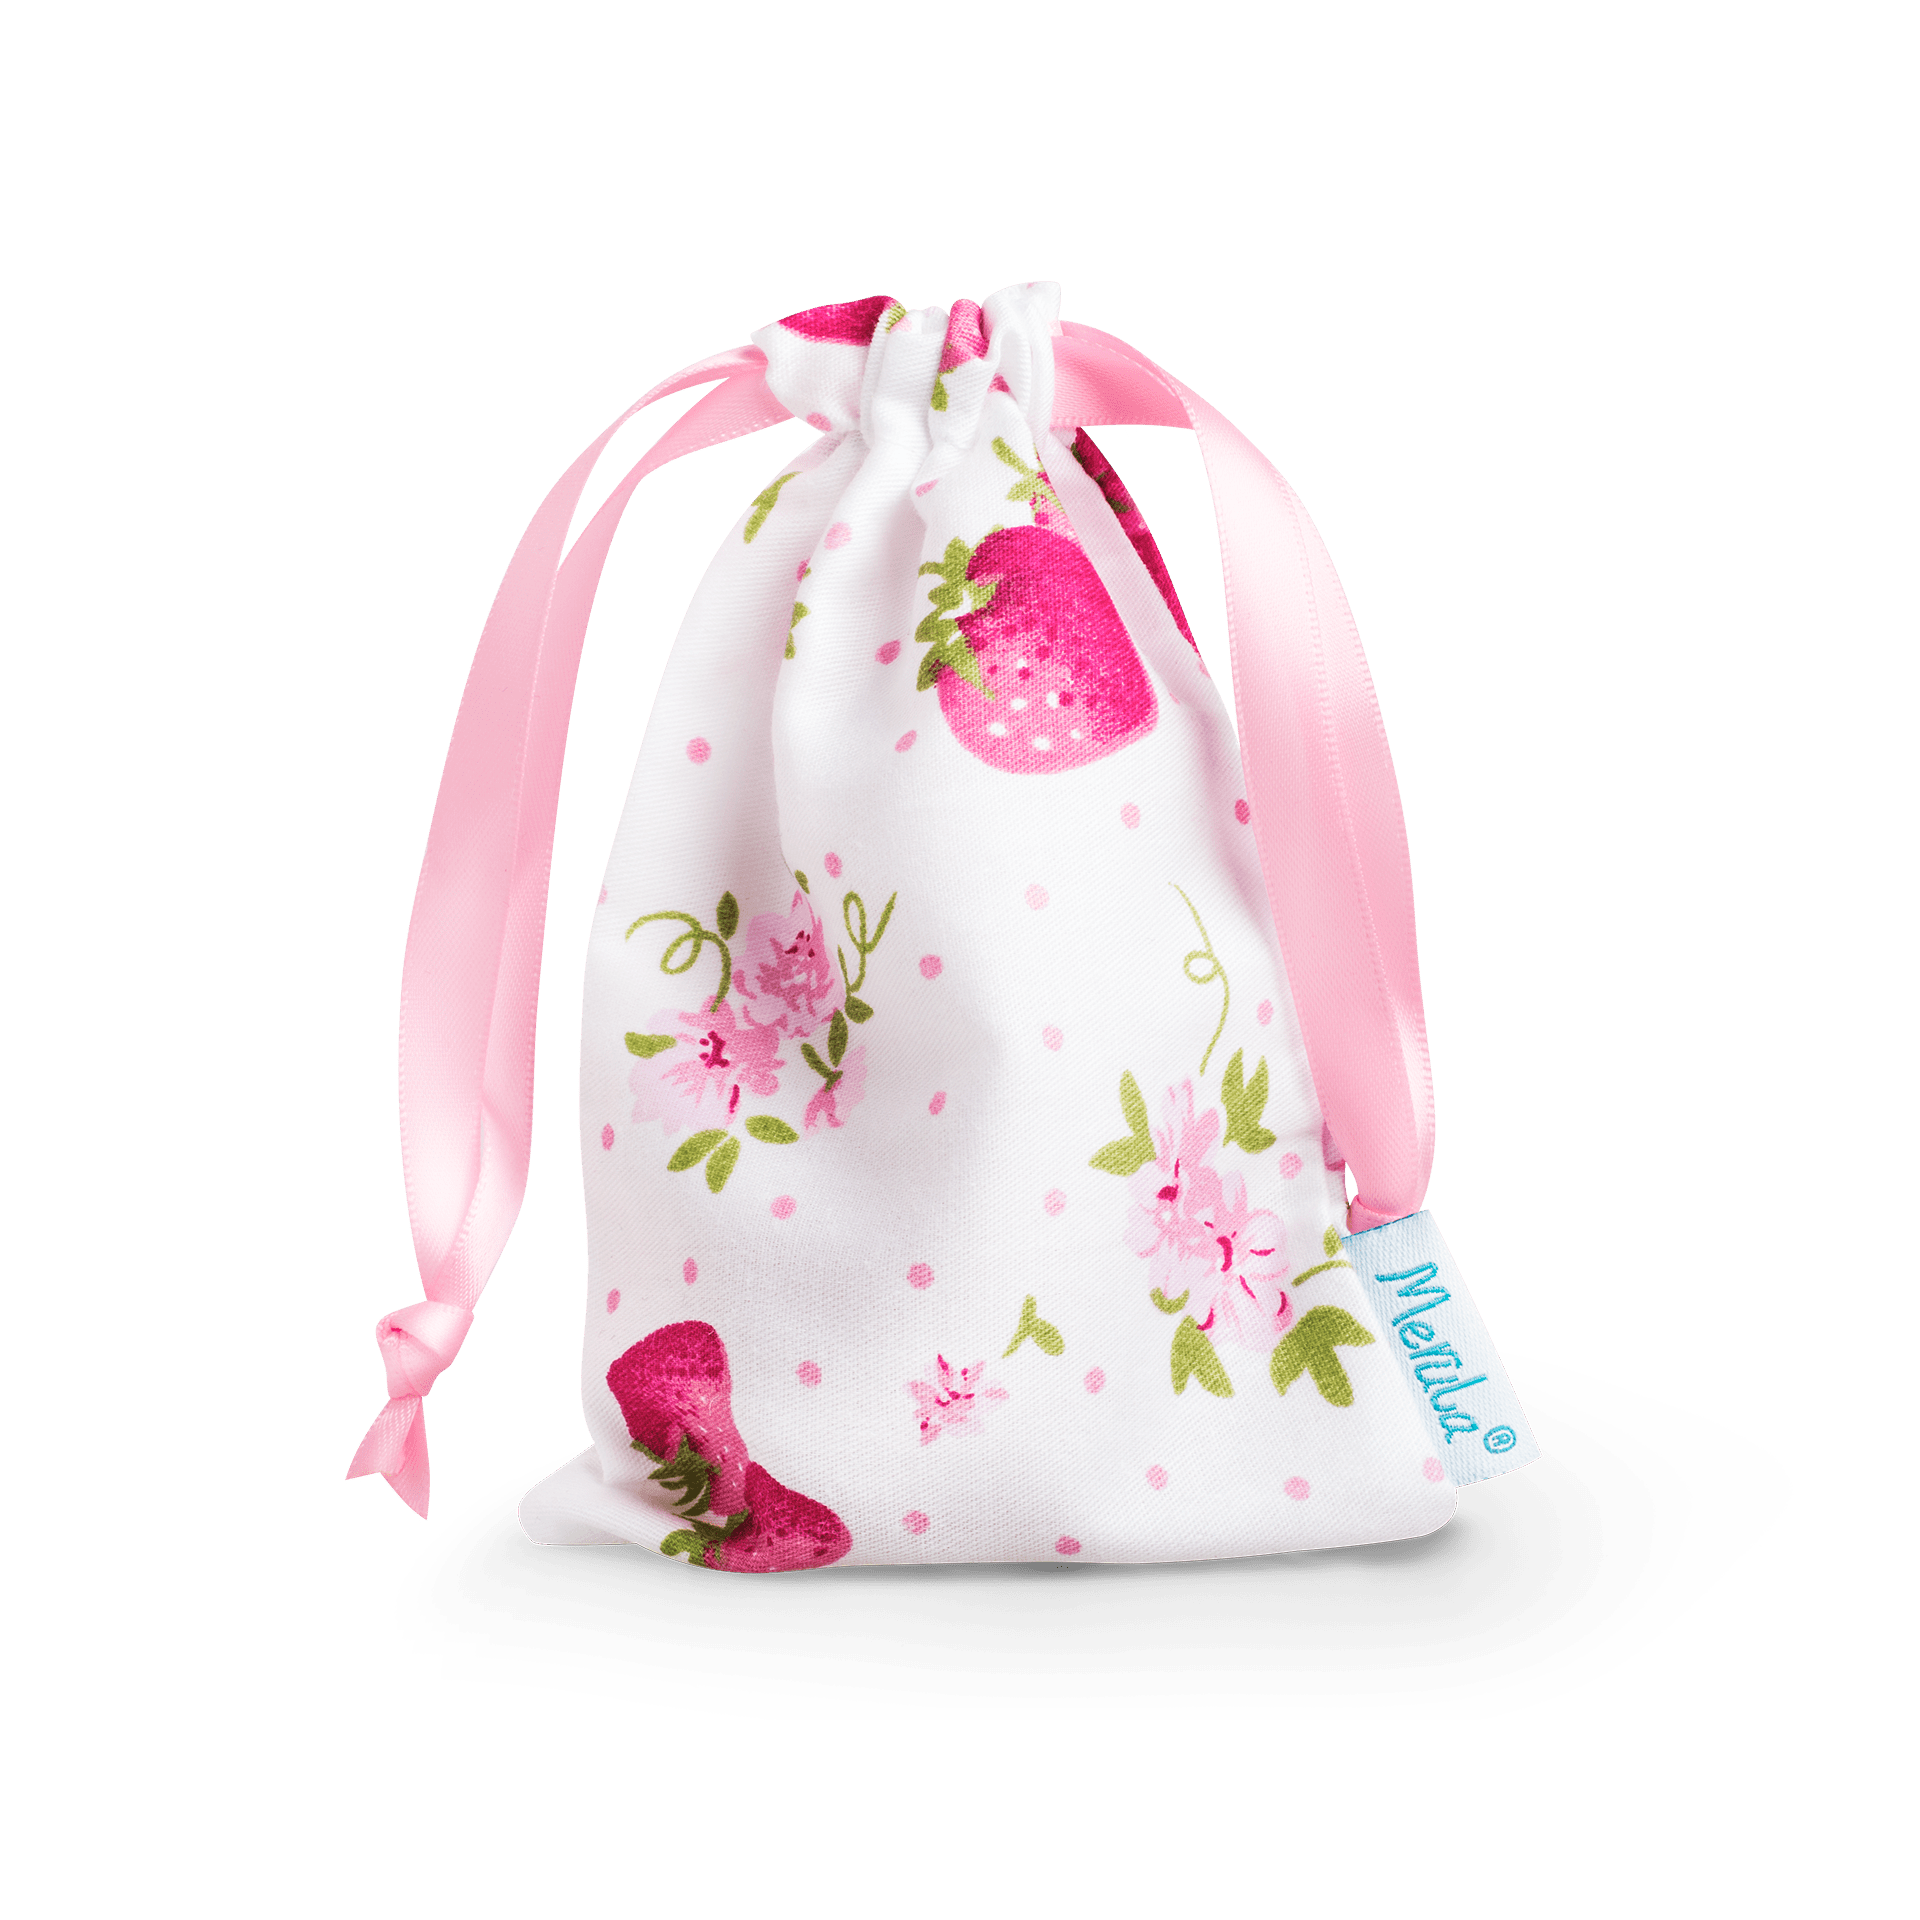 Merula Beutel strawberry